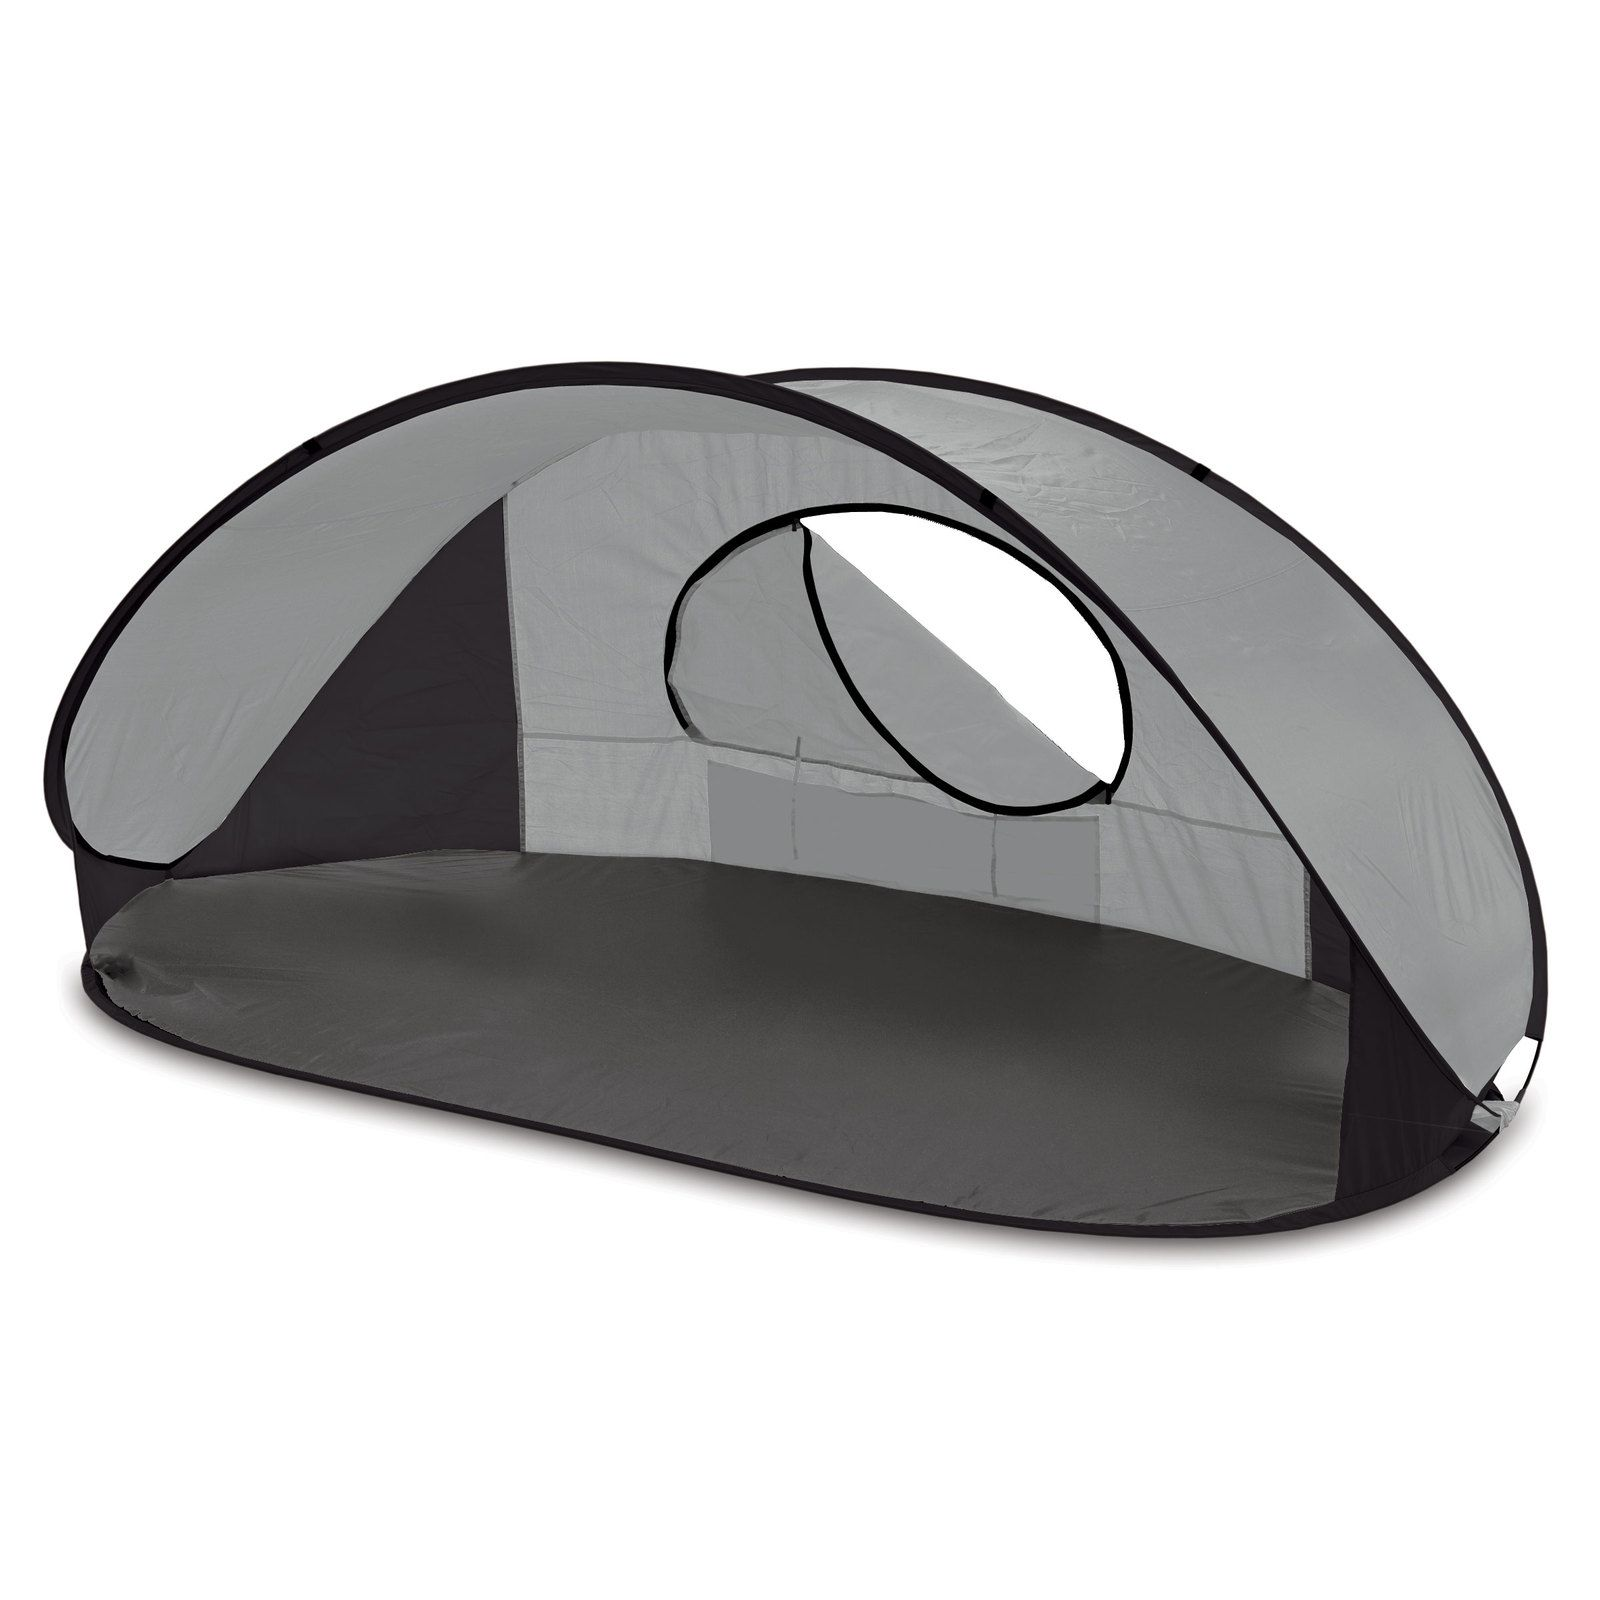 Pop-up Portable Sun and Wind Shelter -Beach Canopy Cabana Gazebo Shade Tent  sc 1 st  Pinterest & Pop-up Portable Sun and Wind Shelter -Beach Canopy Cabana Gazebo ...